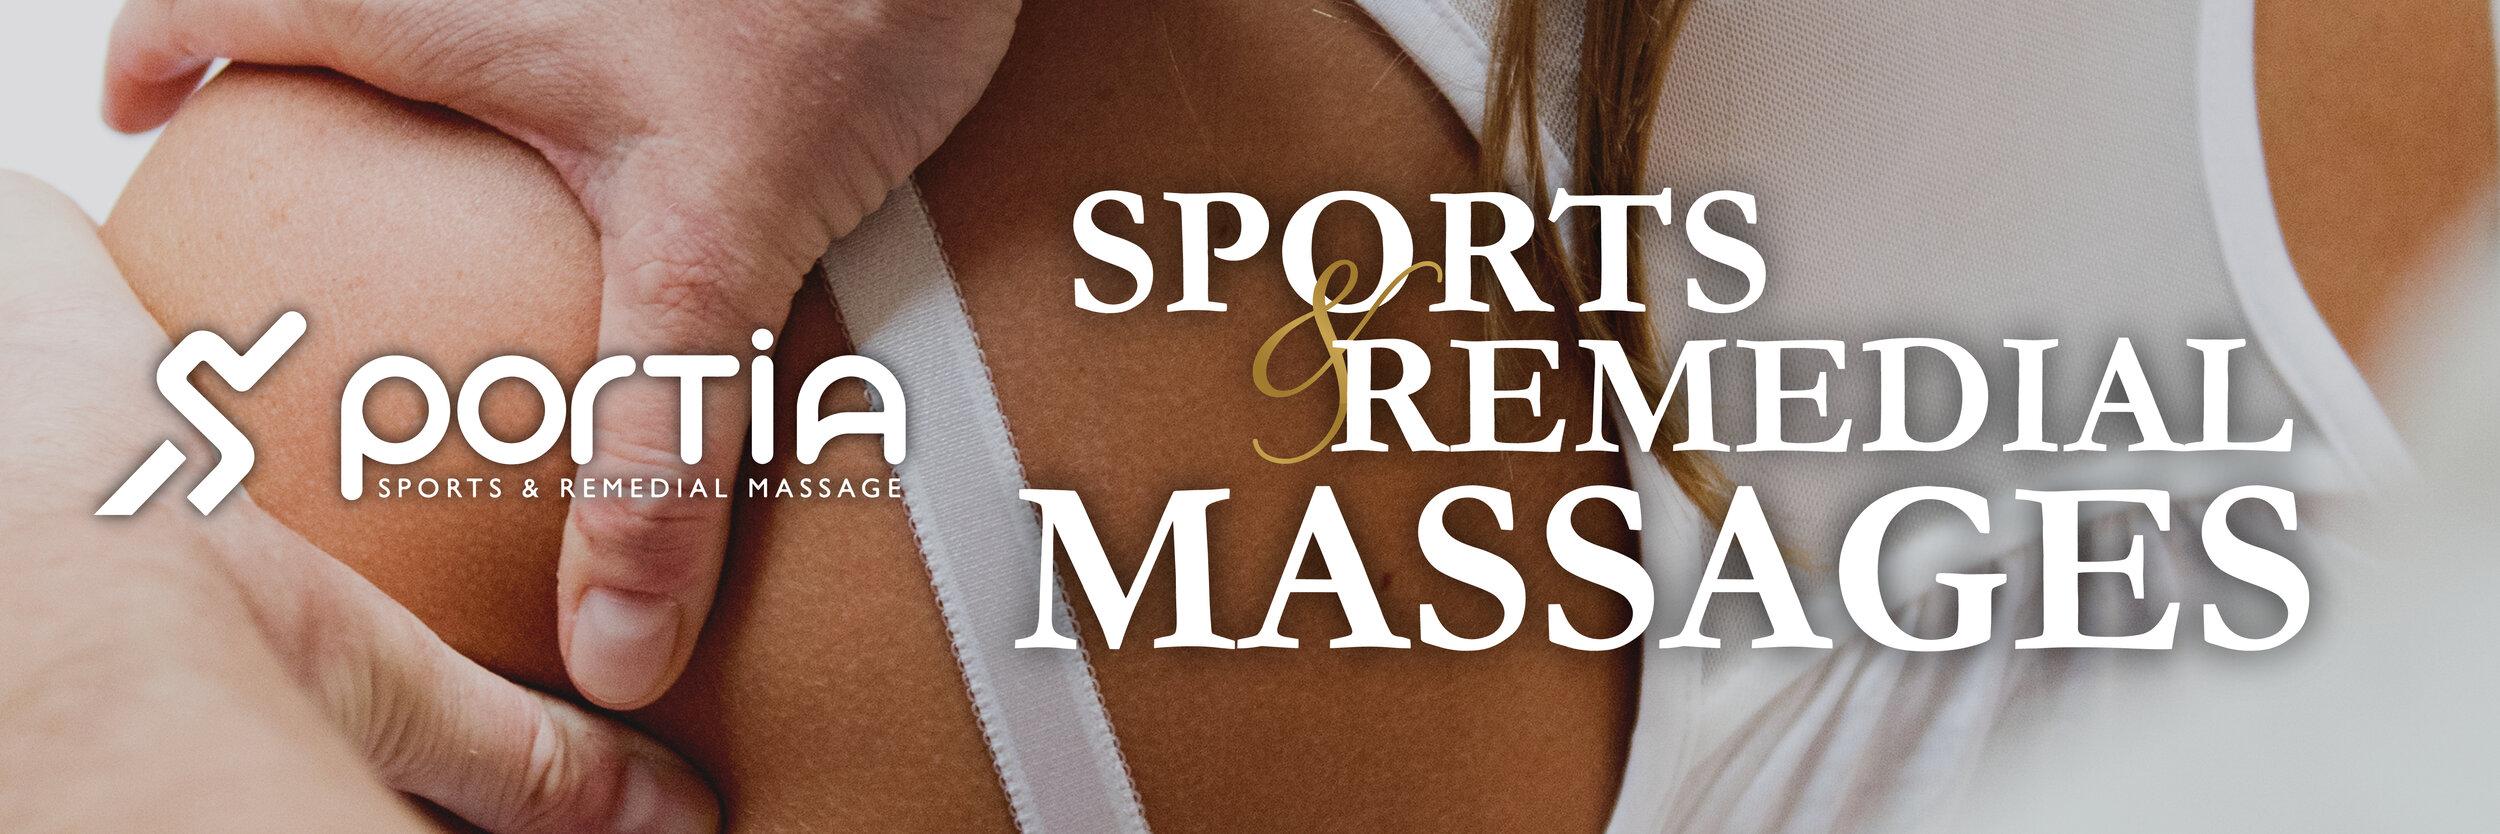 web Banner Sports & Remedial Massages.jpg